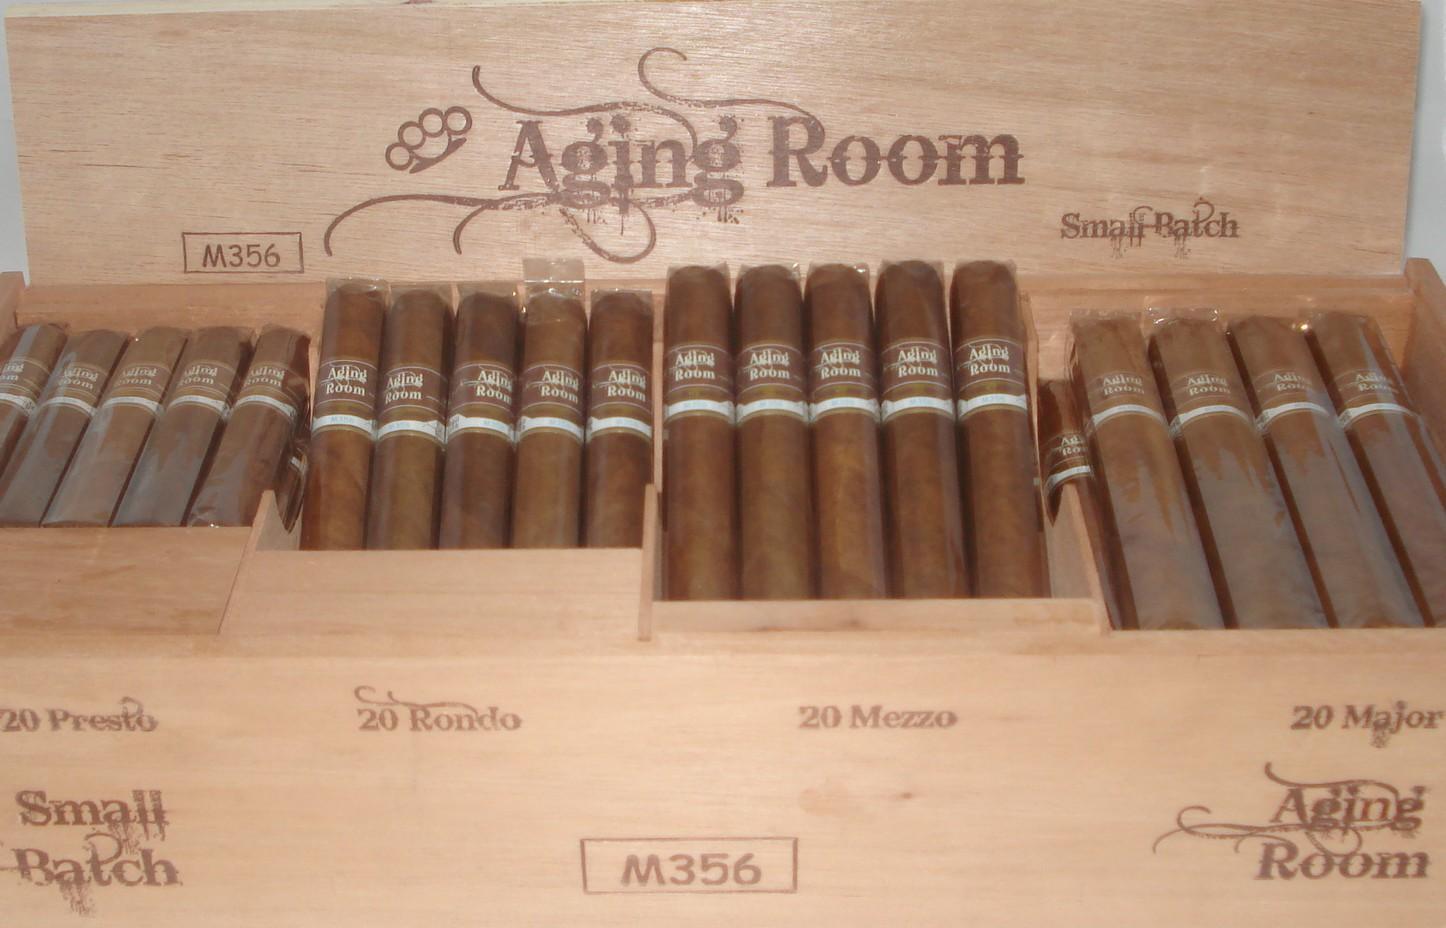 Aging Room m356 Major